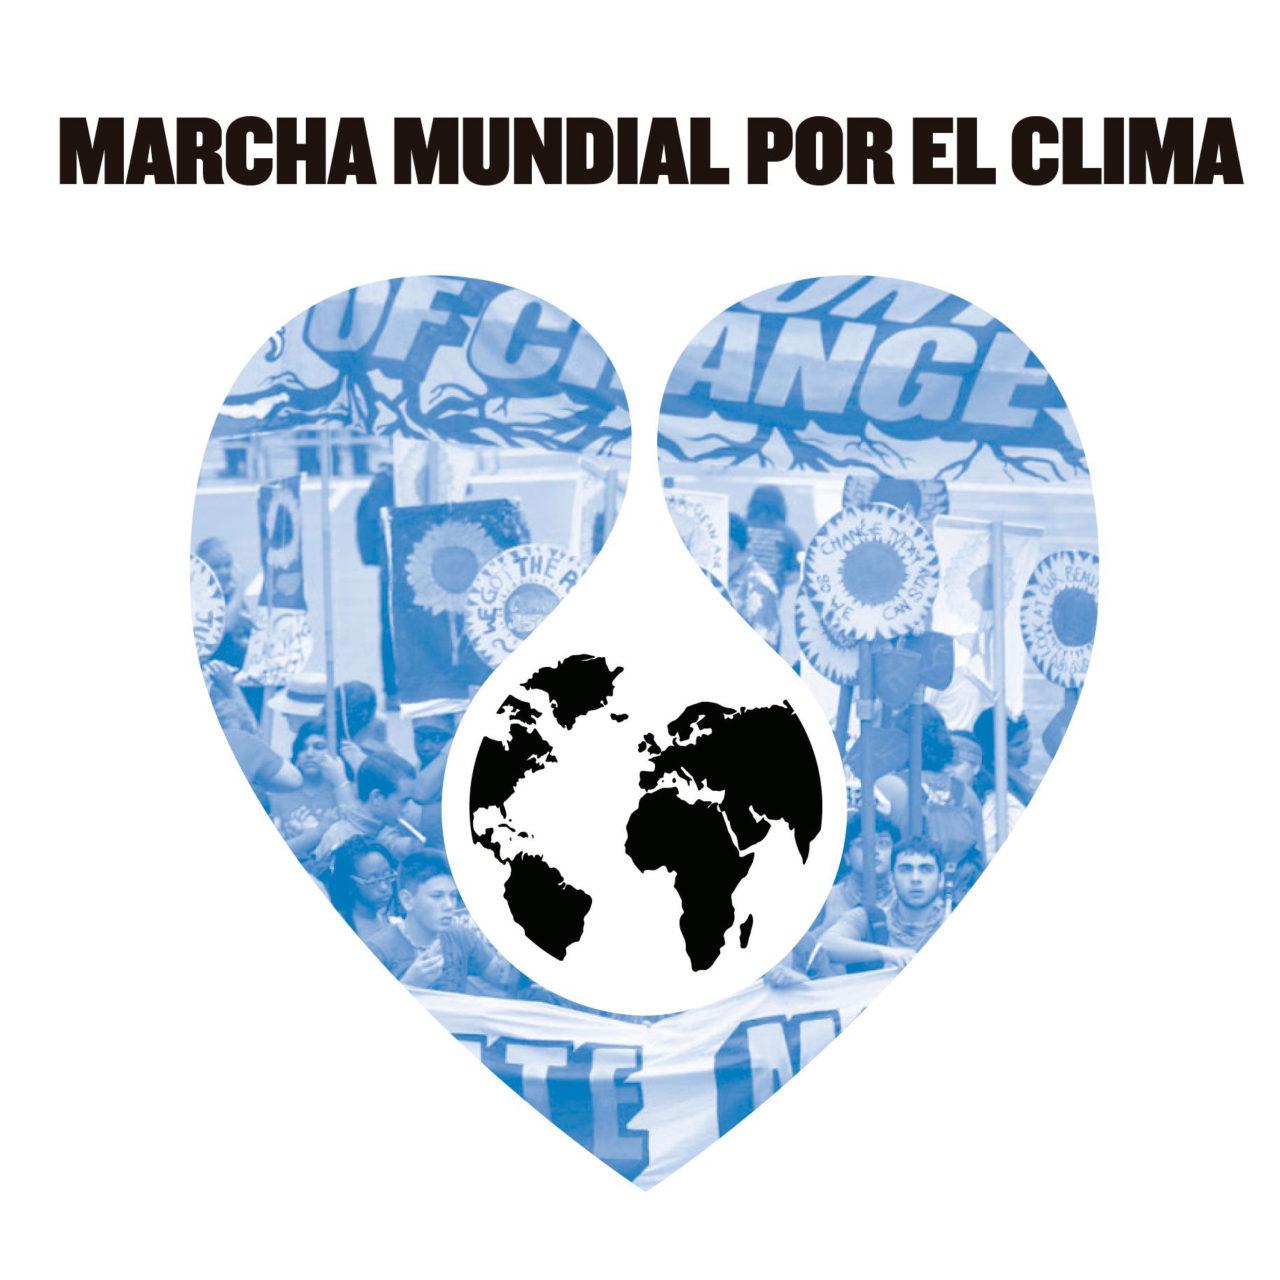 Frente al cambio climático ¡cambiemos de modelo!